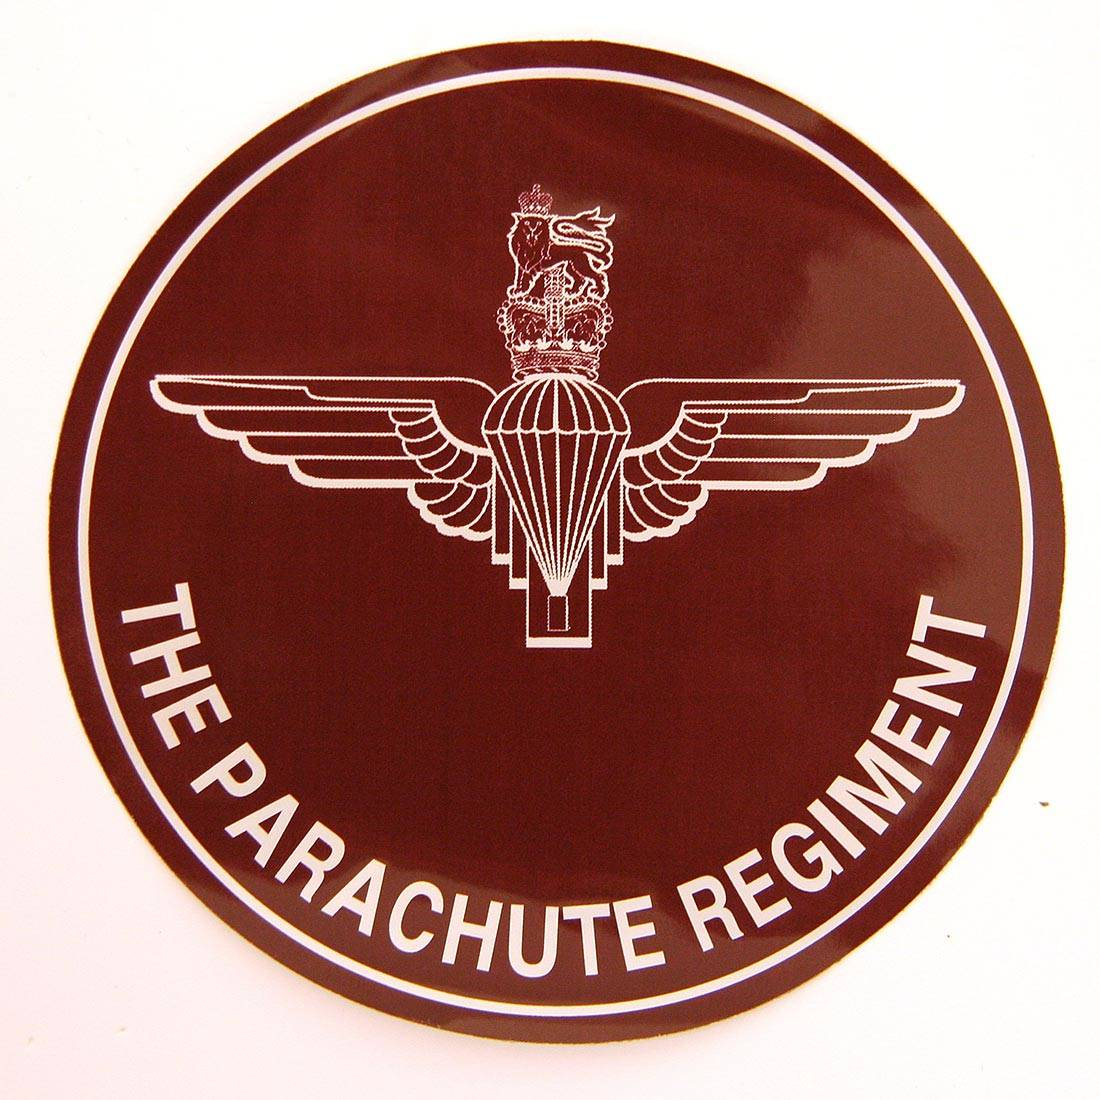 Car Sticker - Parachute Regiment or Pegasus